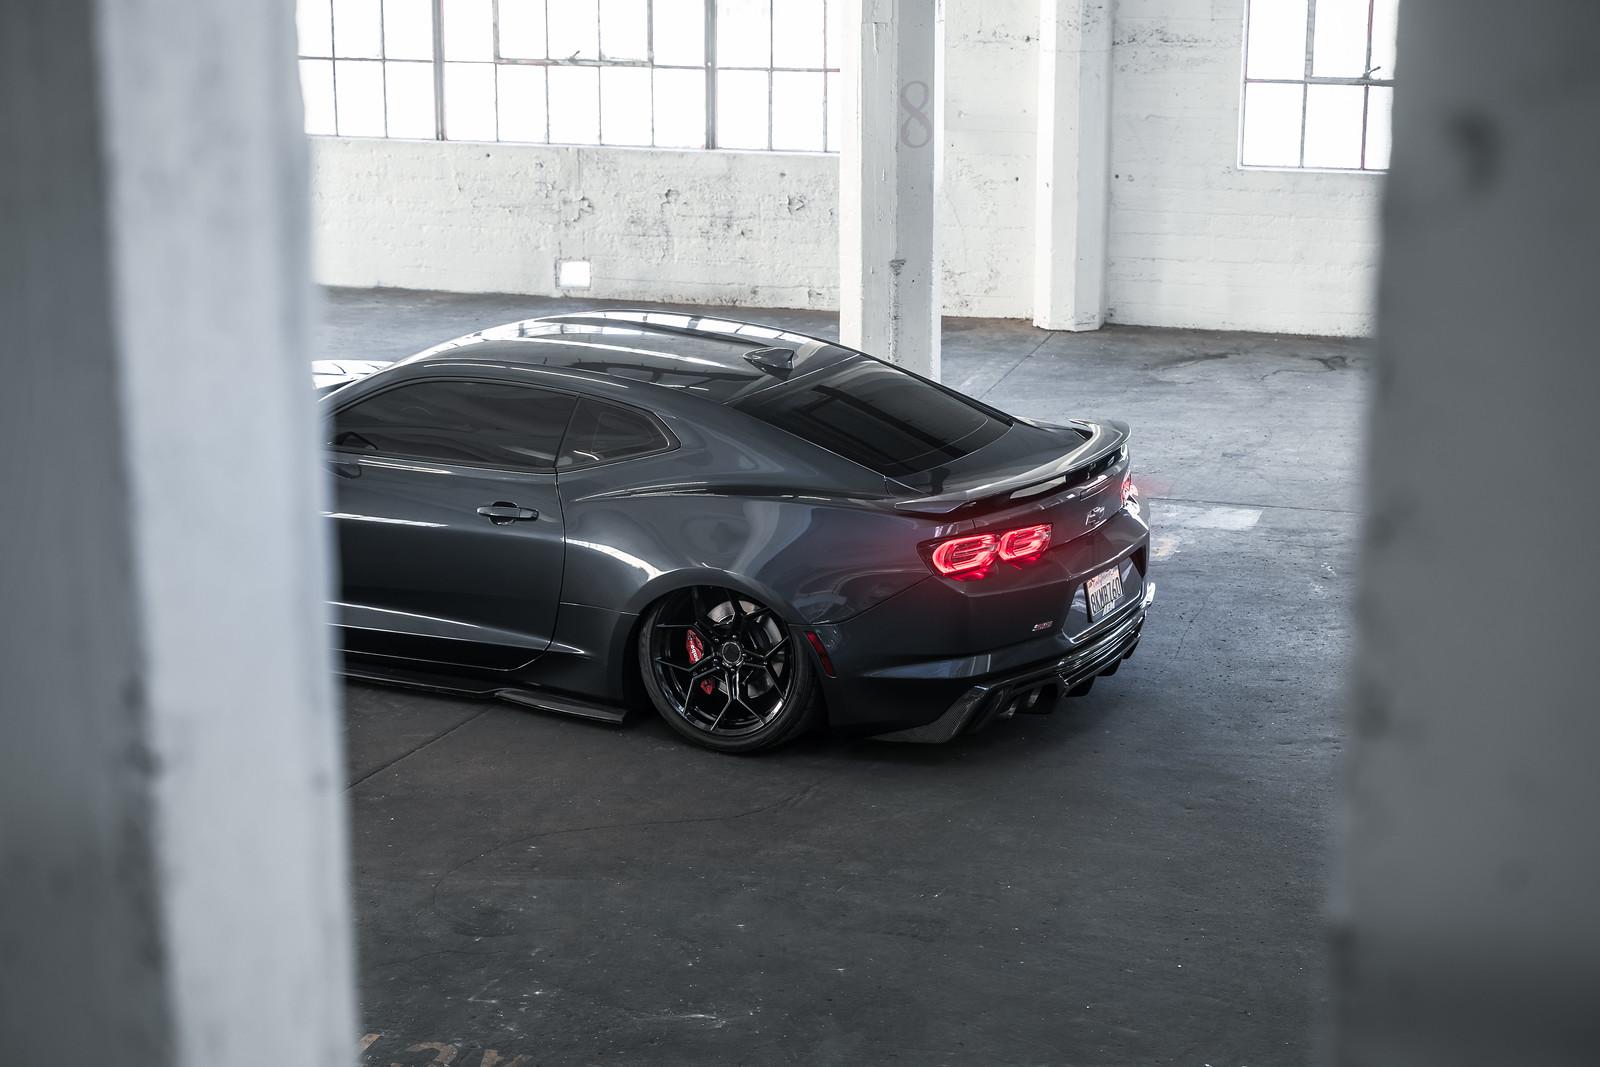 2019_Chevrolet_Camaro_SS_BDF25_Gloss_Black_10